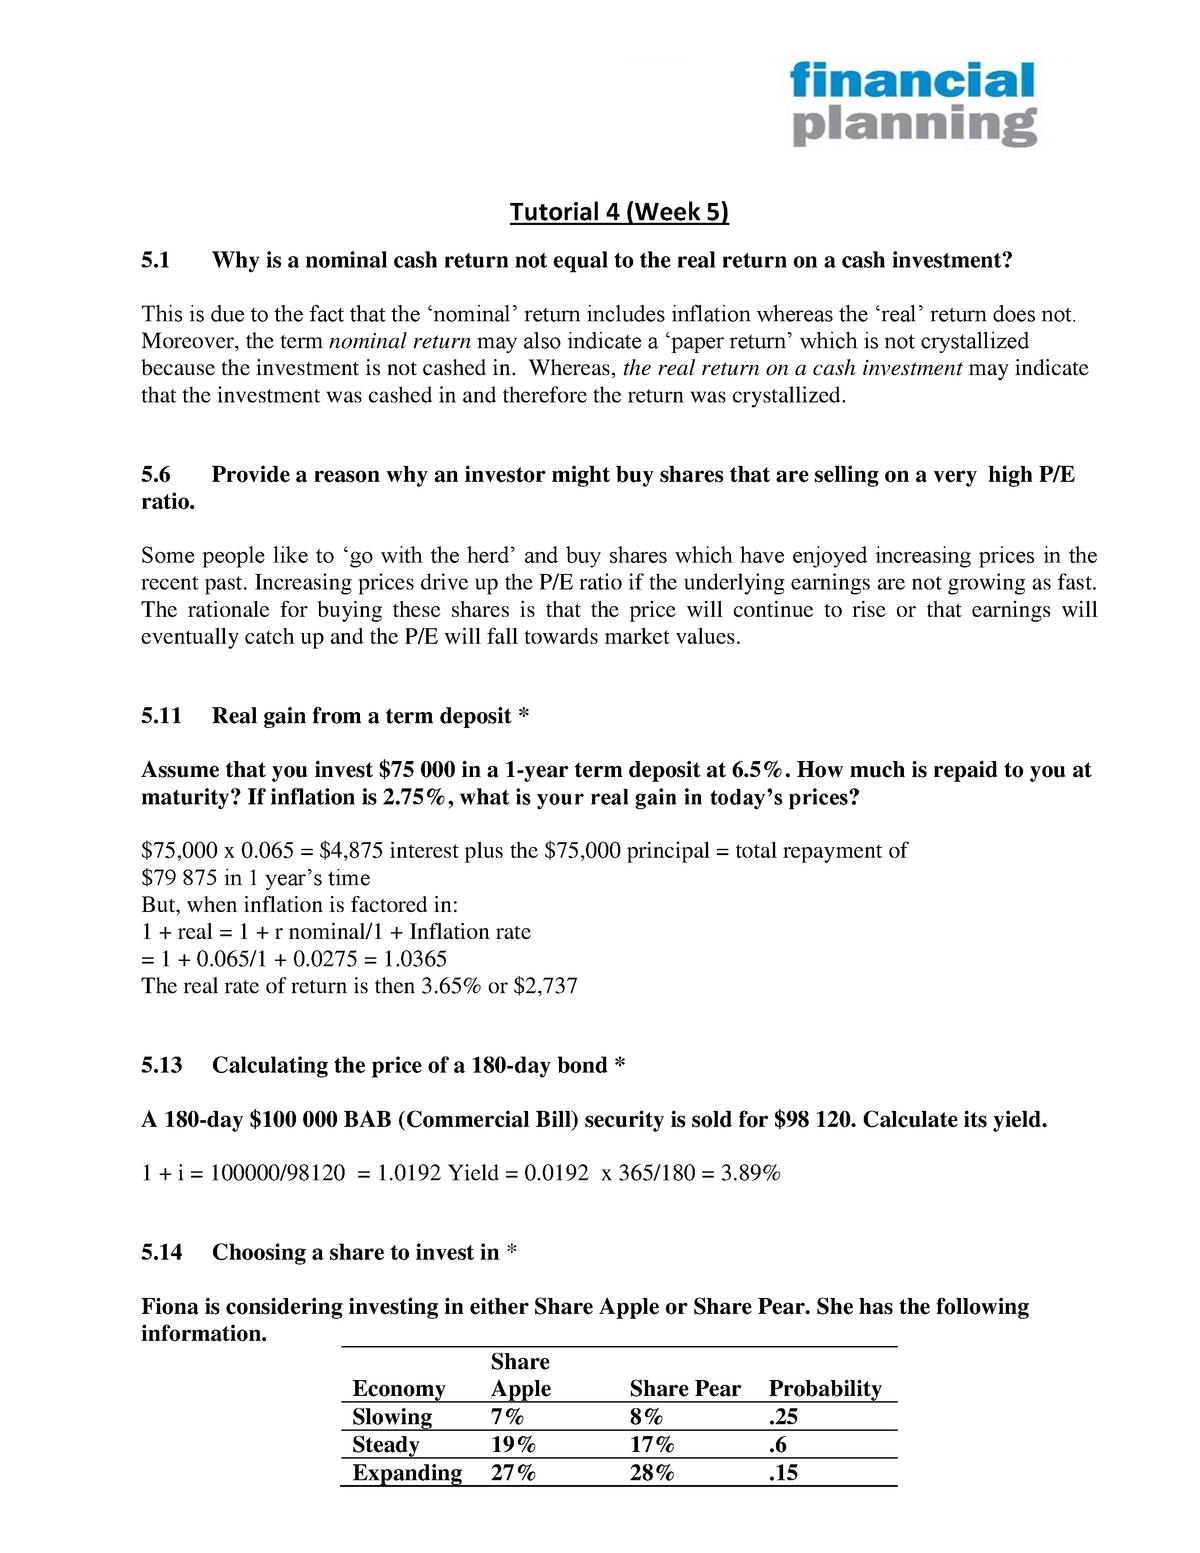 Tutorial 4 Solutions - Personal Finance FM102 - StuDocu